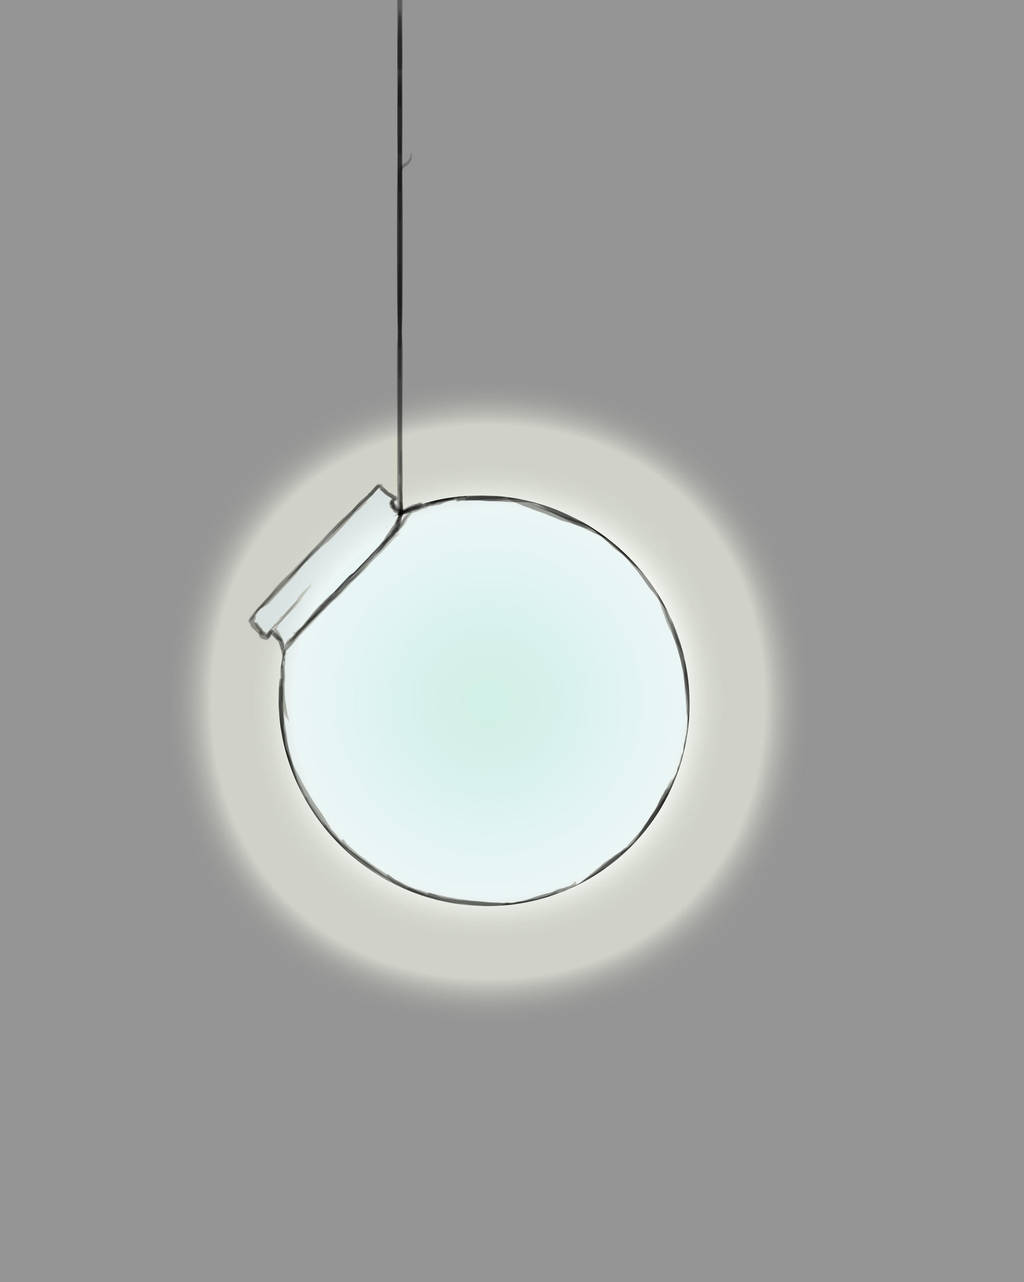 Jar of Light Daily sketch #608 by GothicVampireFreak